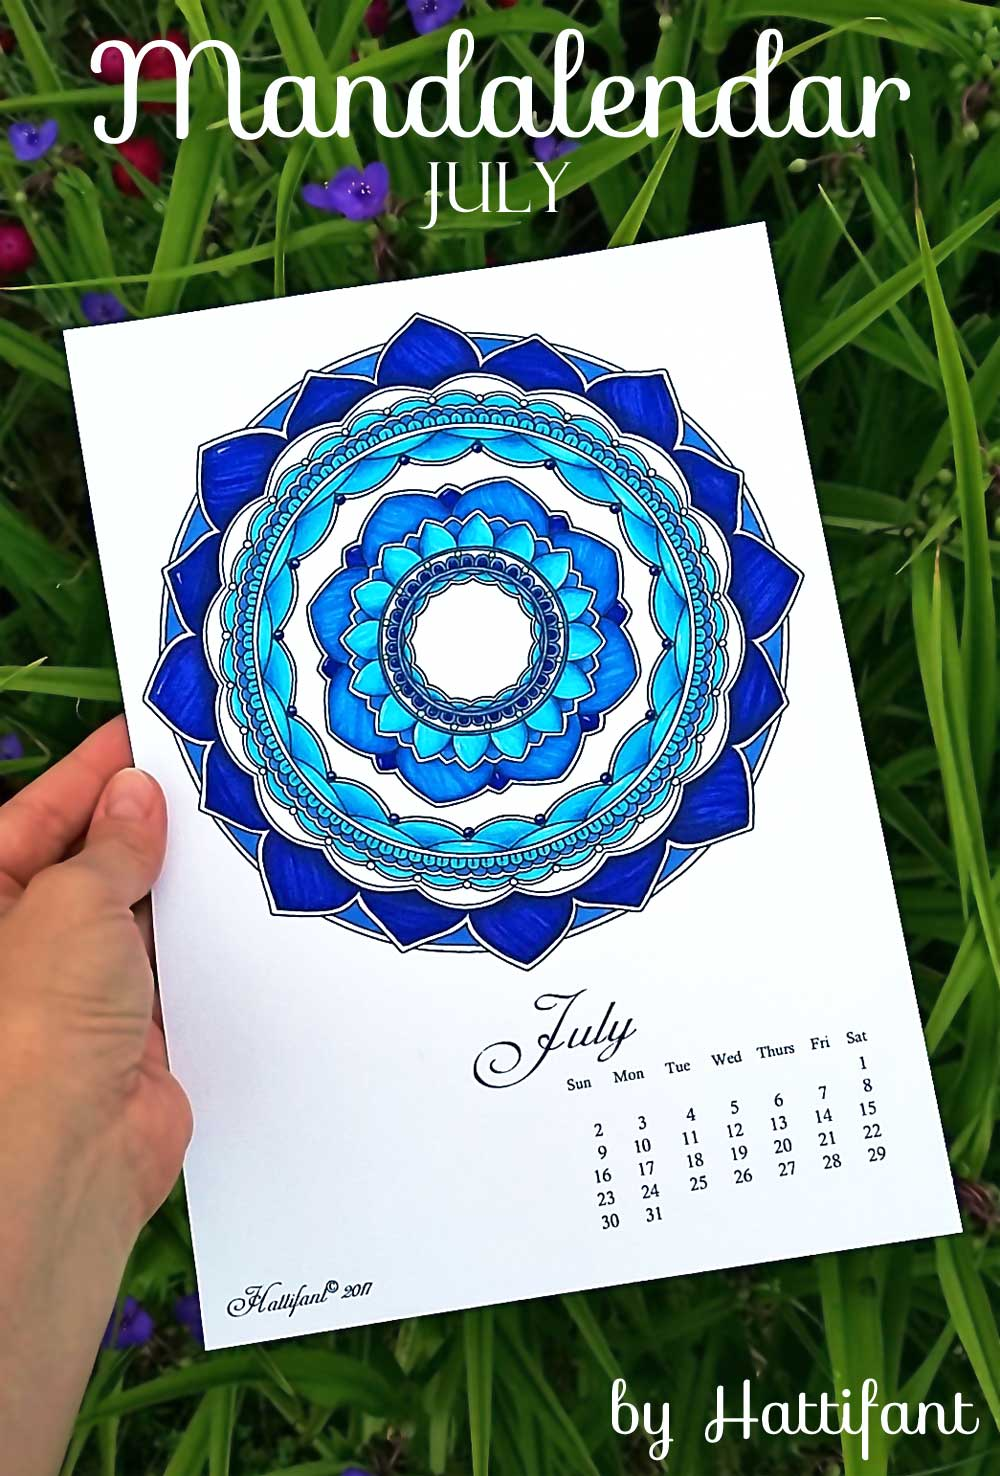 Hattifant's Mandalendar July 2017 a monthly Mandala Calendar Coloring Page